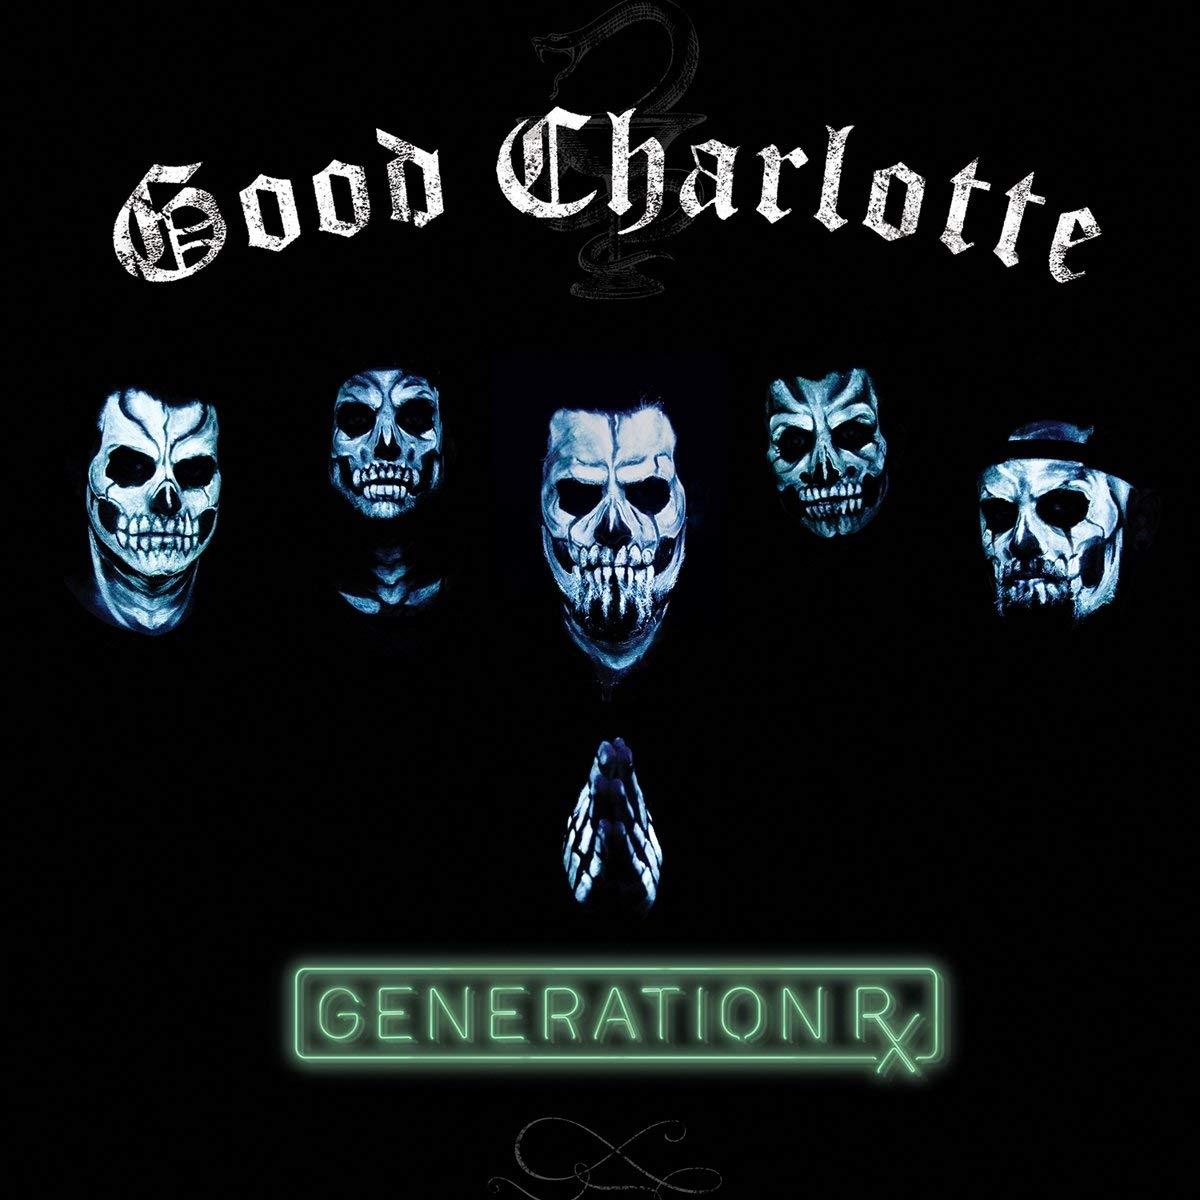 Good Charlotte Generation Rx Lp Waterloo Records